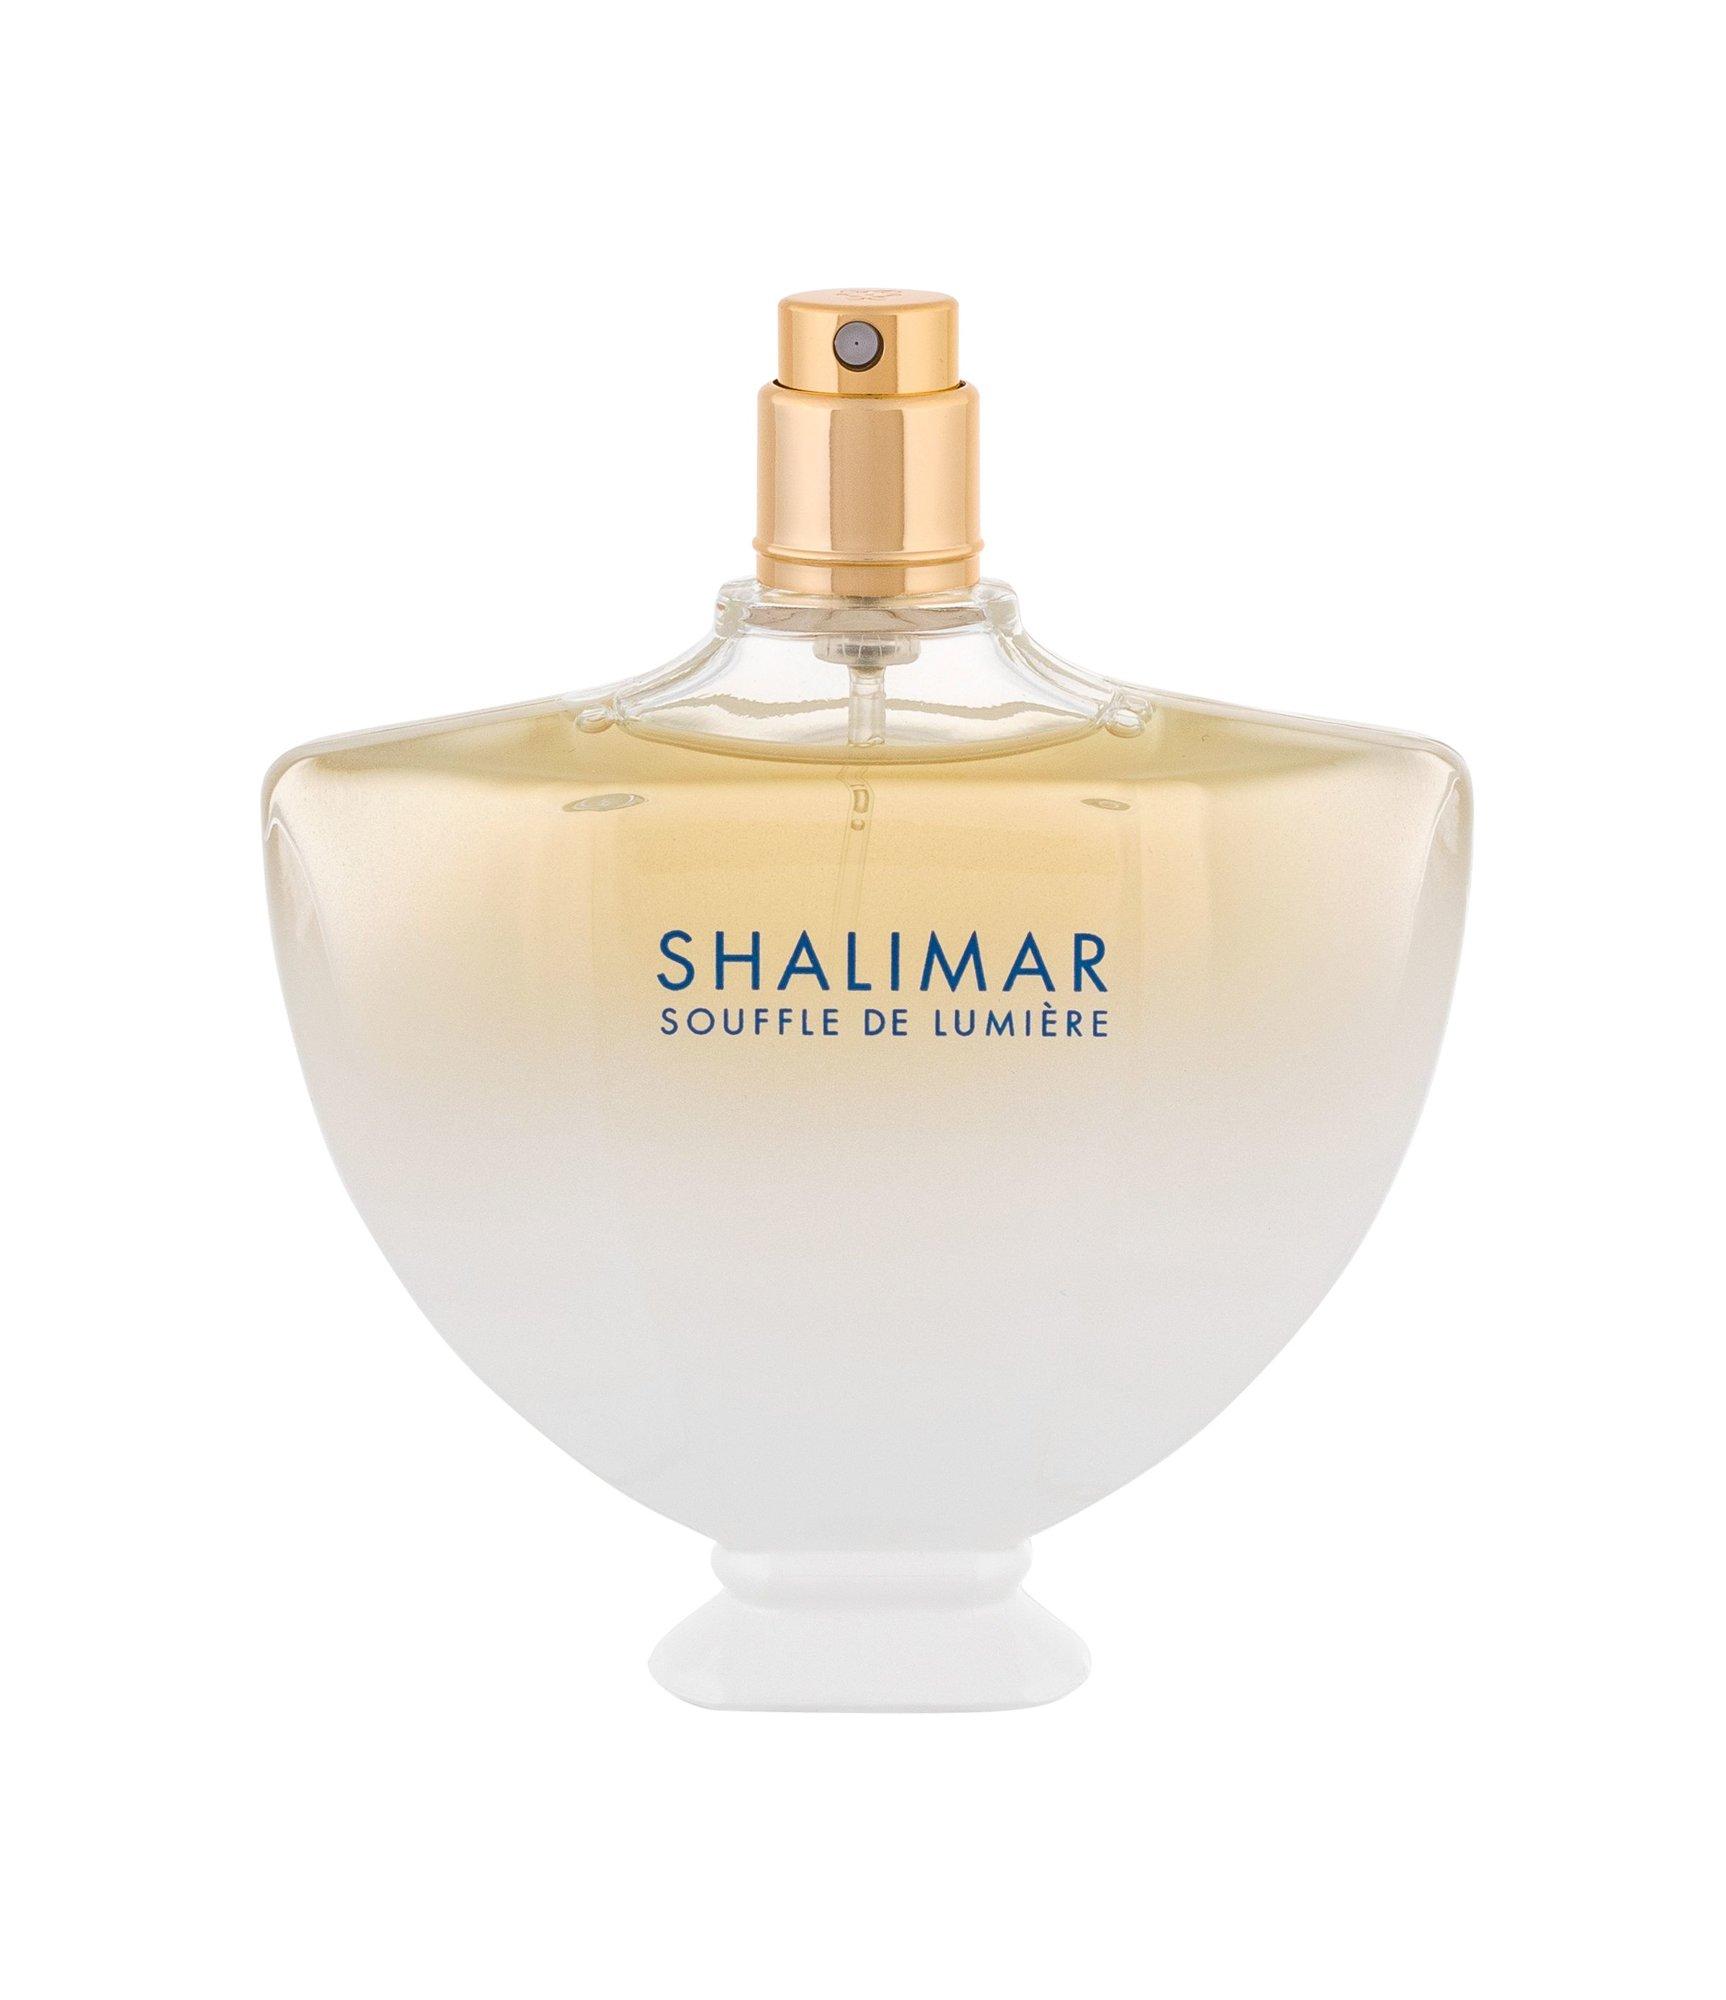 Guerlain Shalimar Souffle de Lumiere, Parfumovaná voda 50ml, Tester